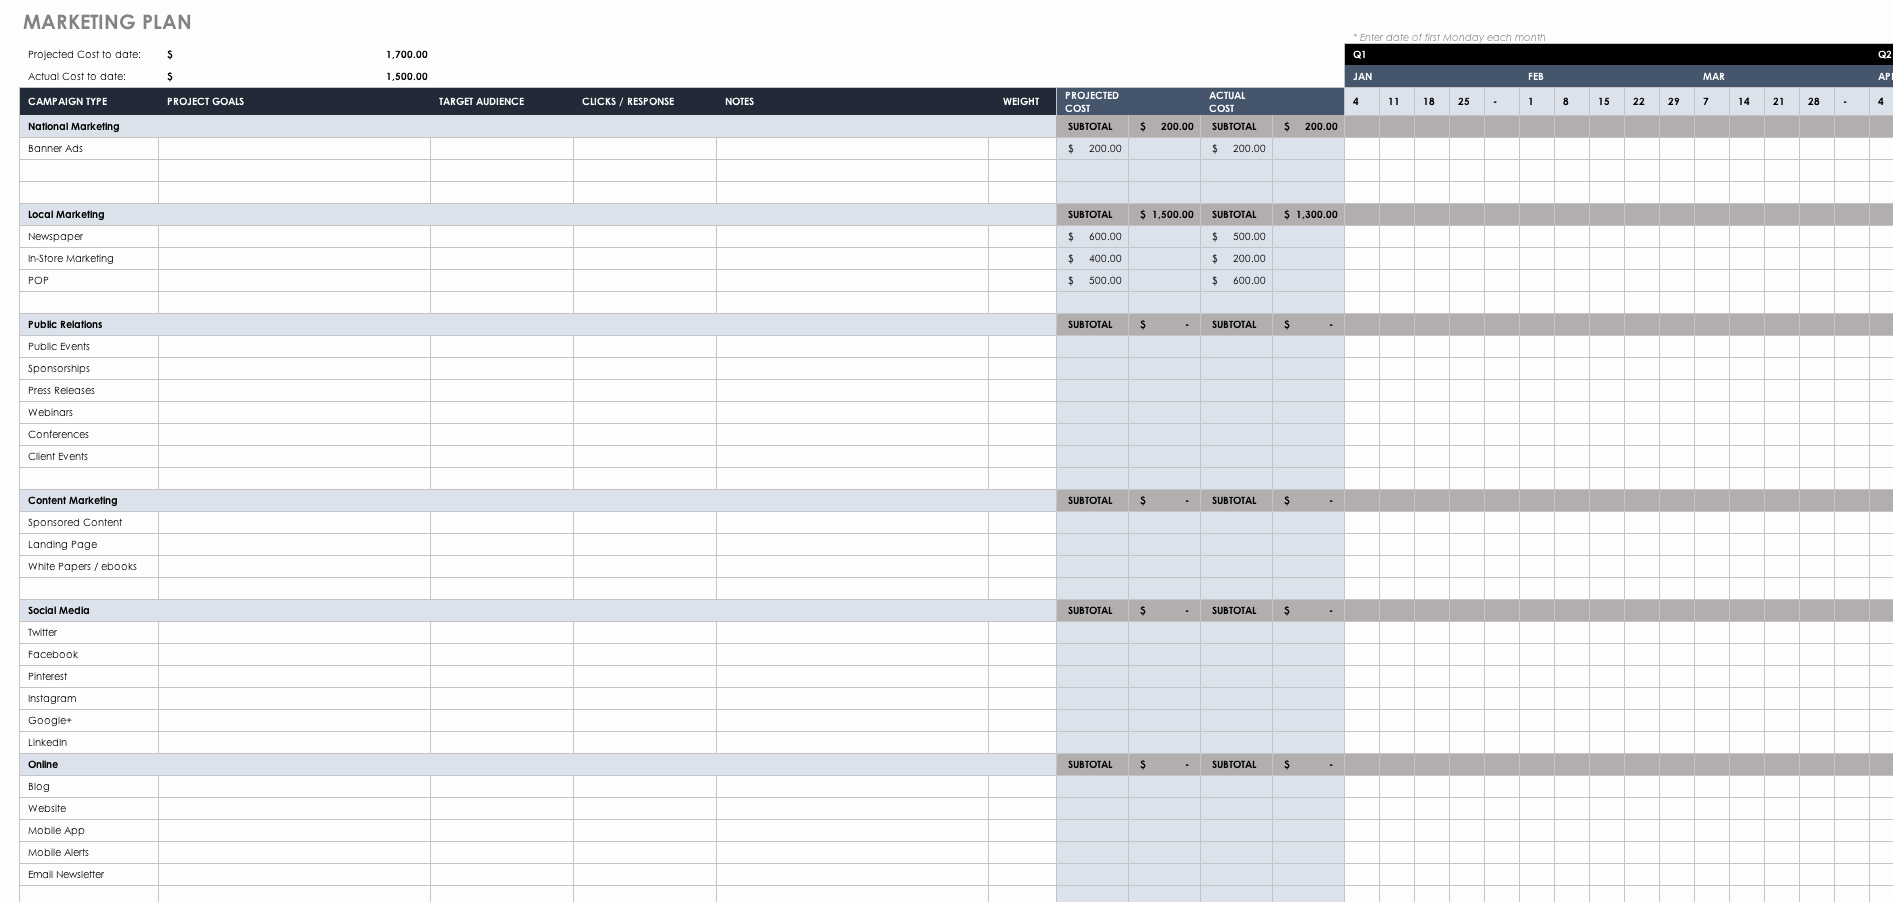 B2b Marketing Plan Template Elegant Free Marketing Plan Templates for Excel